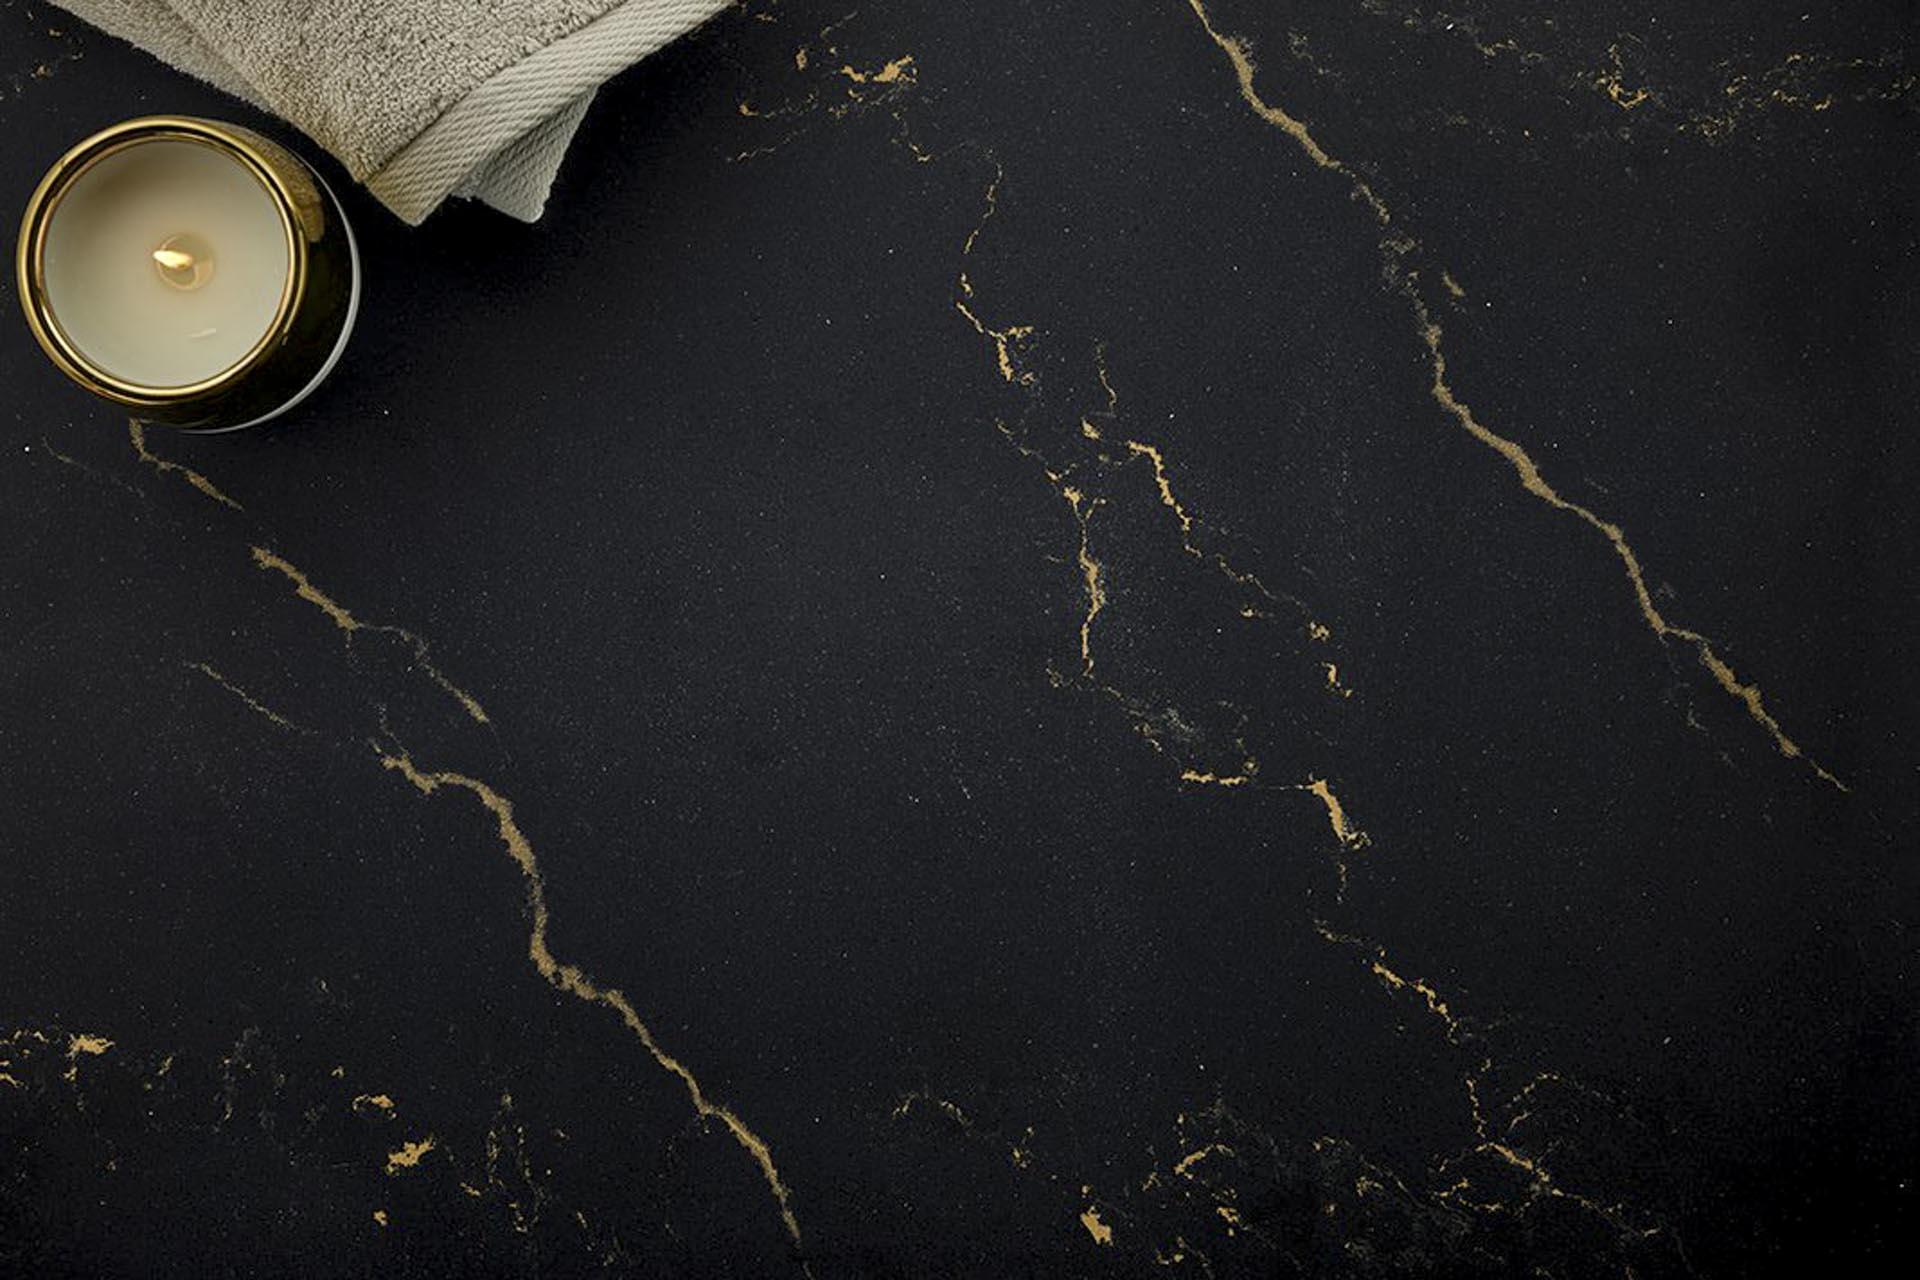 Cambria woodcroft black and gold quartz